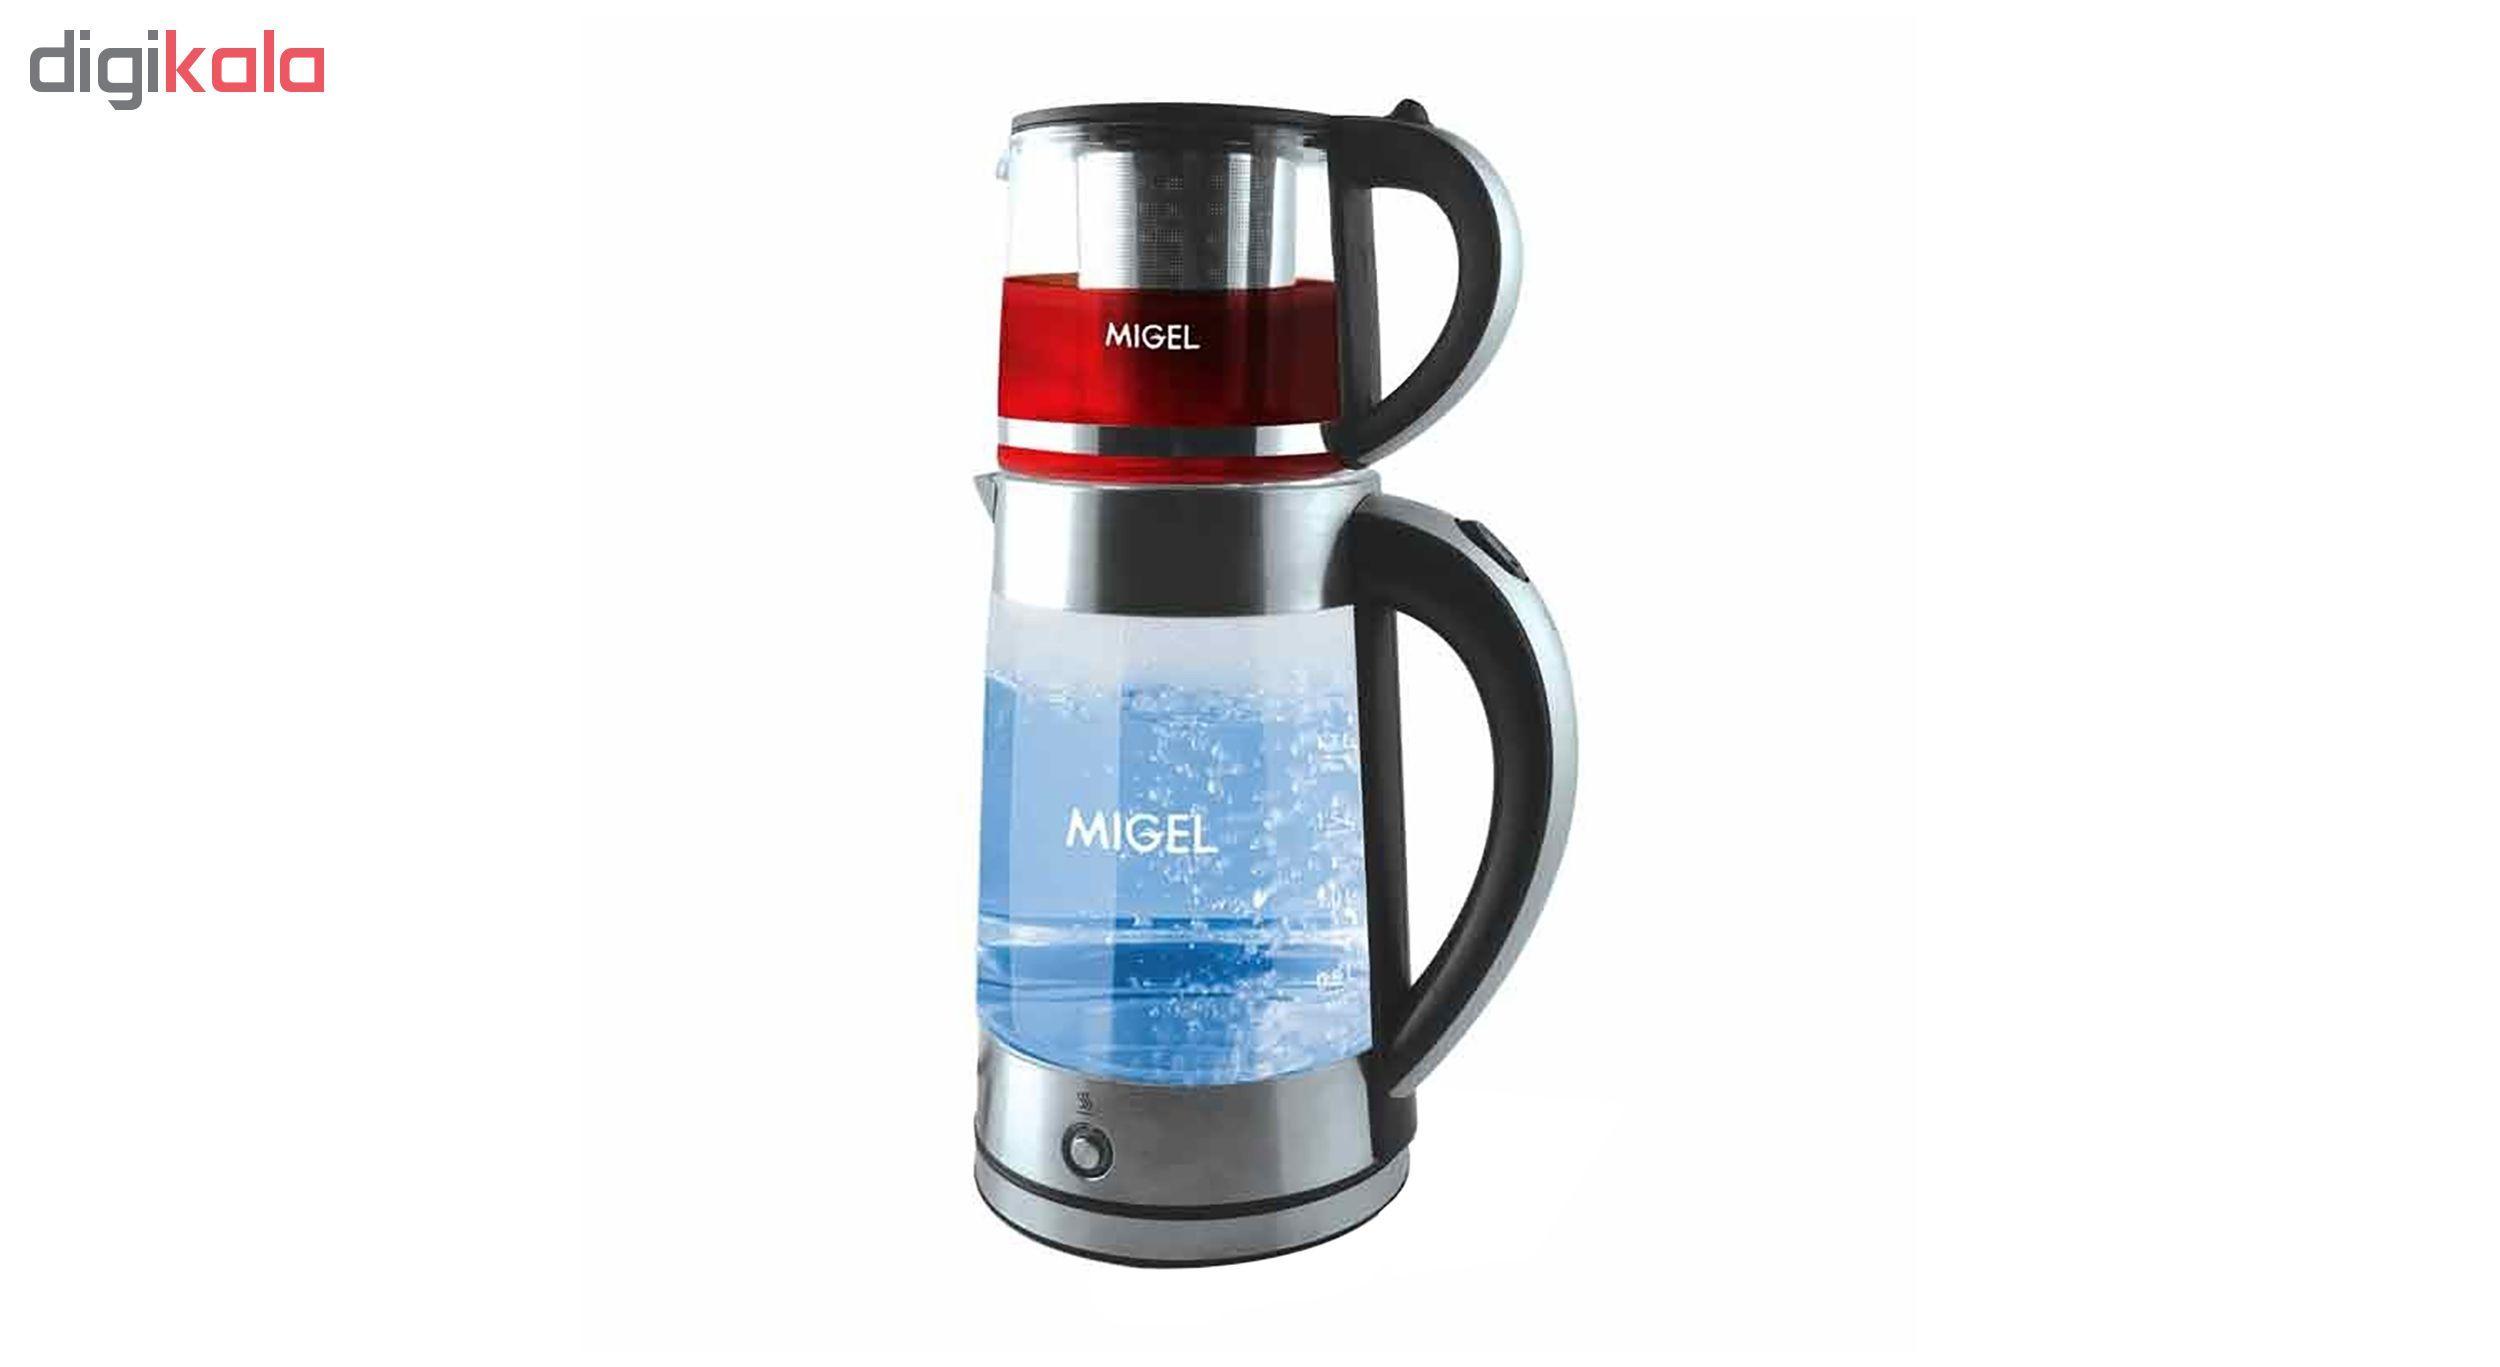 چای ساز میگل مدل GTS 220 main 1 1